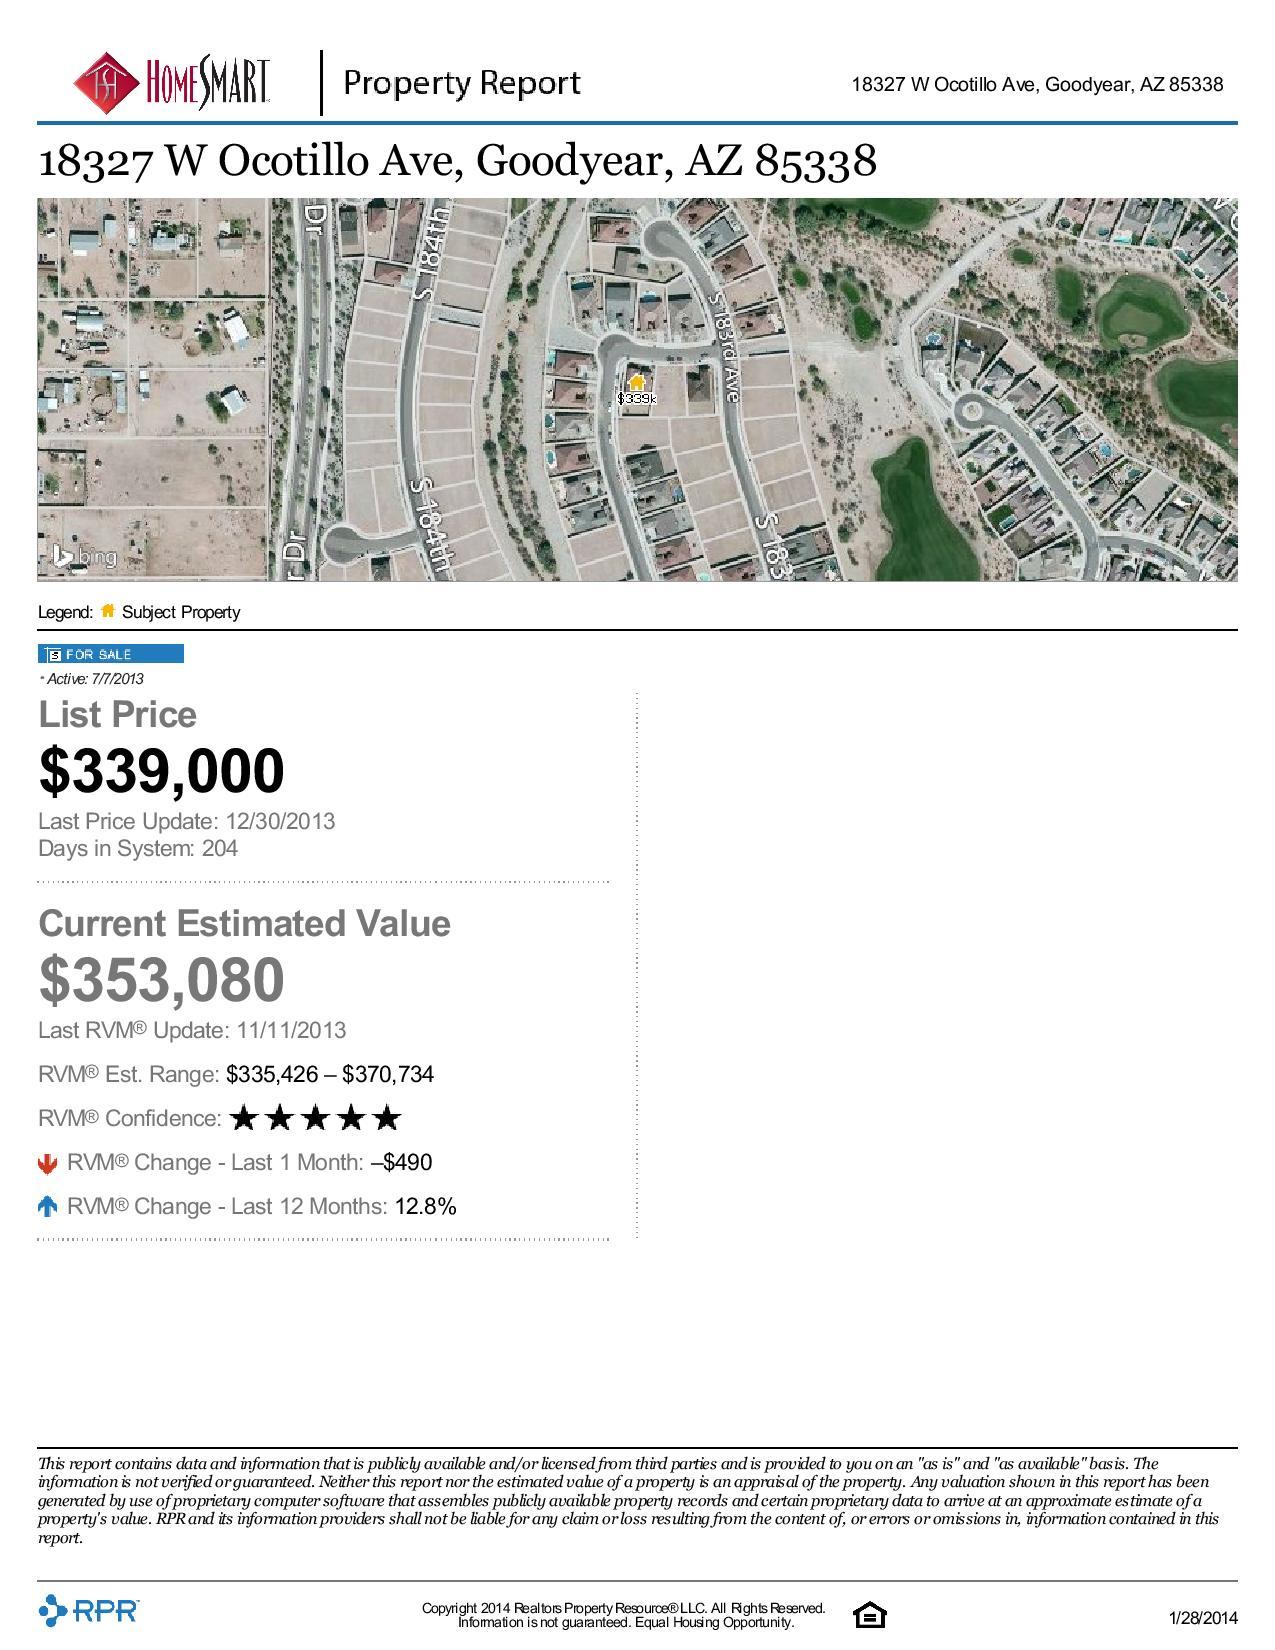 18327-W-Ocotillo-Ave-Goodyear-AZ-85338.pdf-page-002